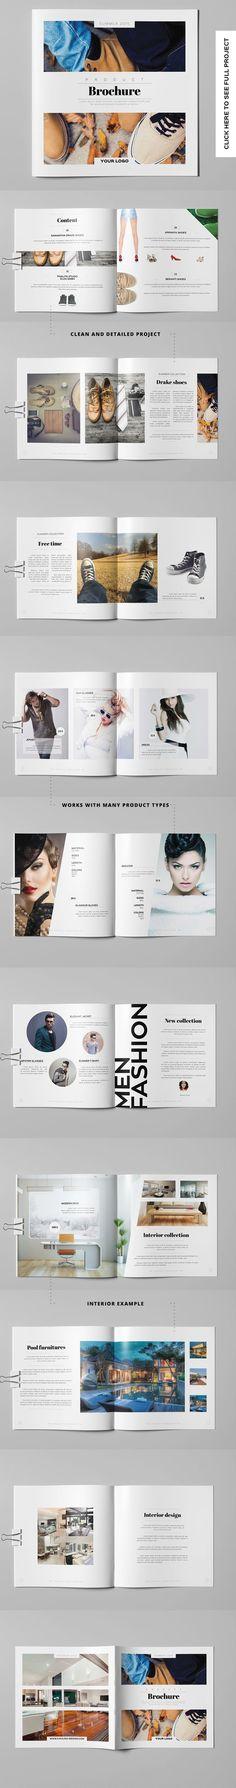 Product Brochure/Photo Book. I love the layout of these pages. Confira as nossas recomendações! http://www.estrategiadigital.pt/category/livros-marketing-digital/